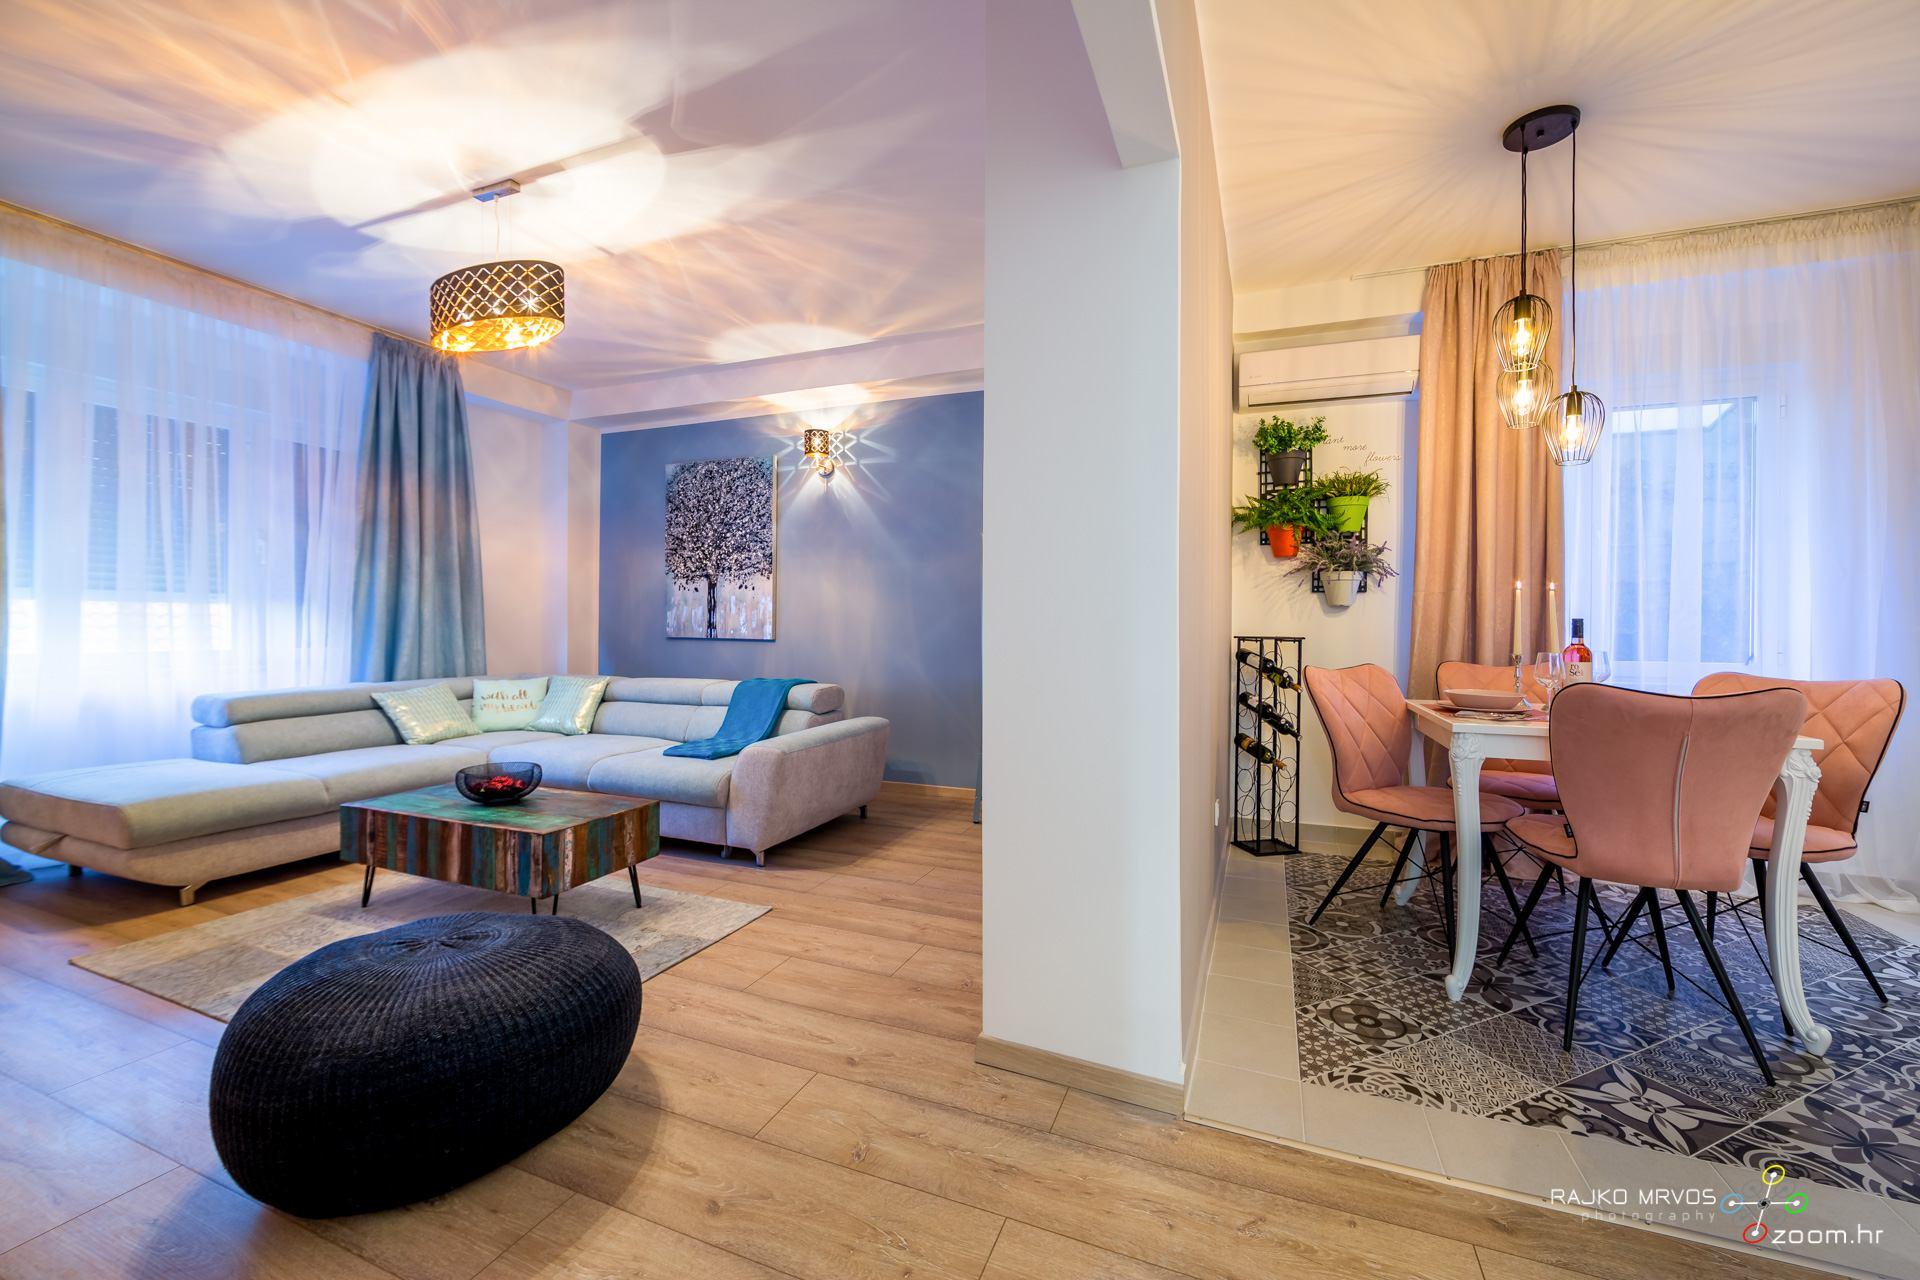 fotografiranje-interijera-fotograf-apartmana-vila-kuca-hotela-apartman-Gabby-Rijeka-10